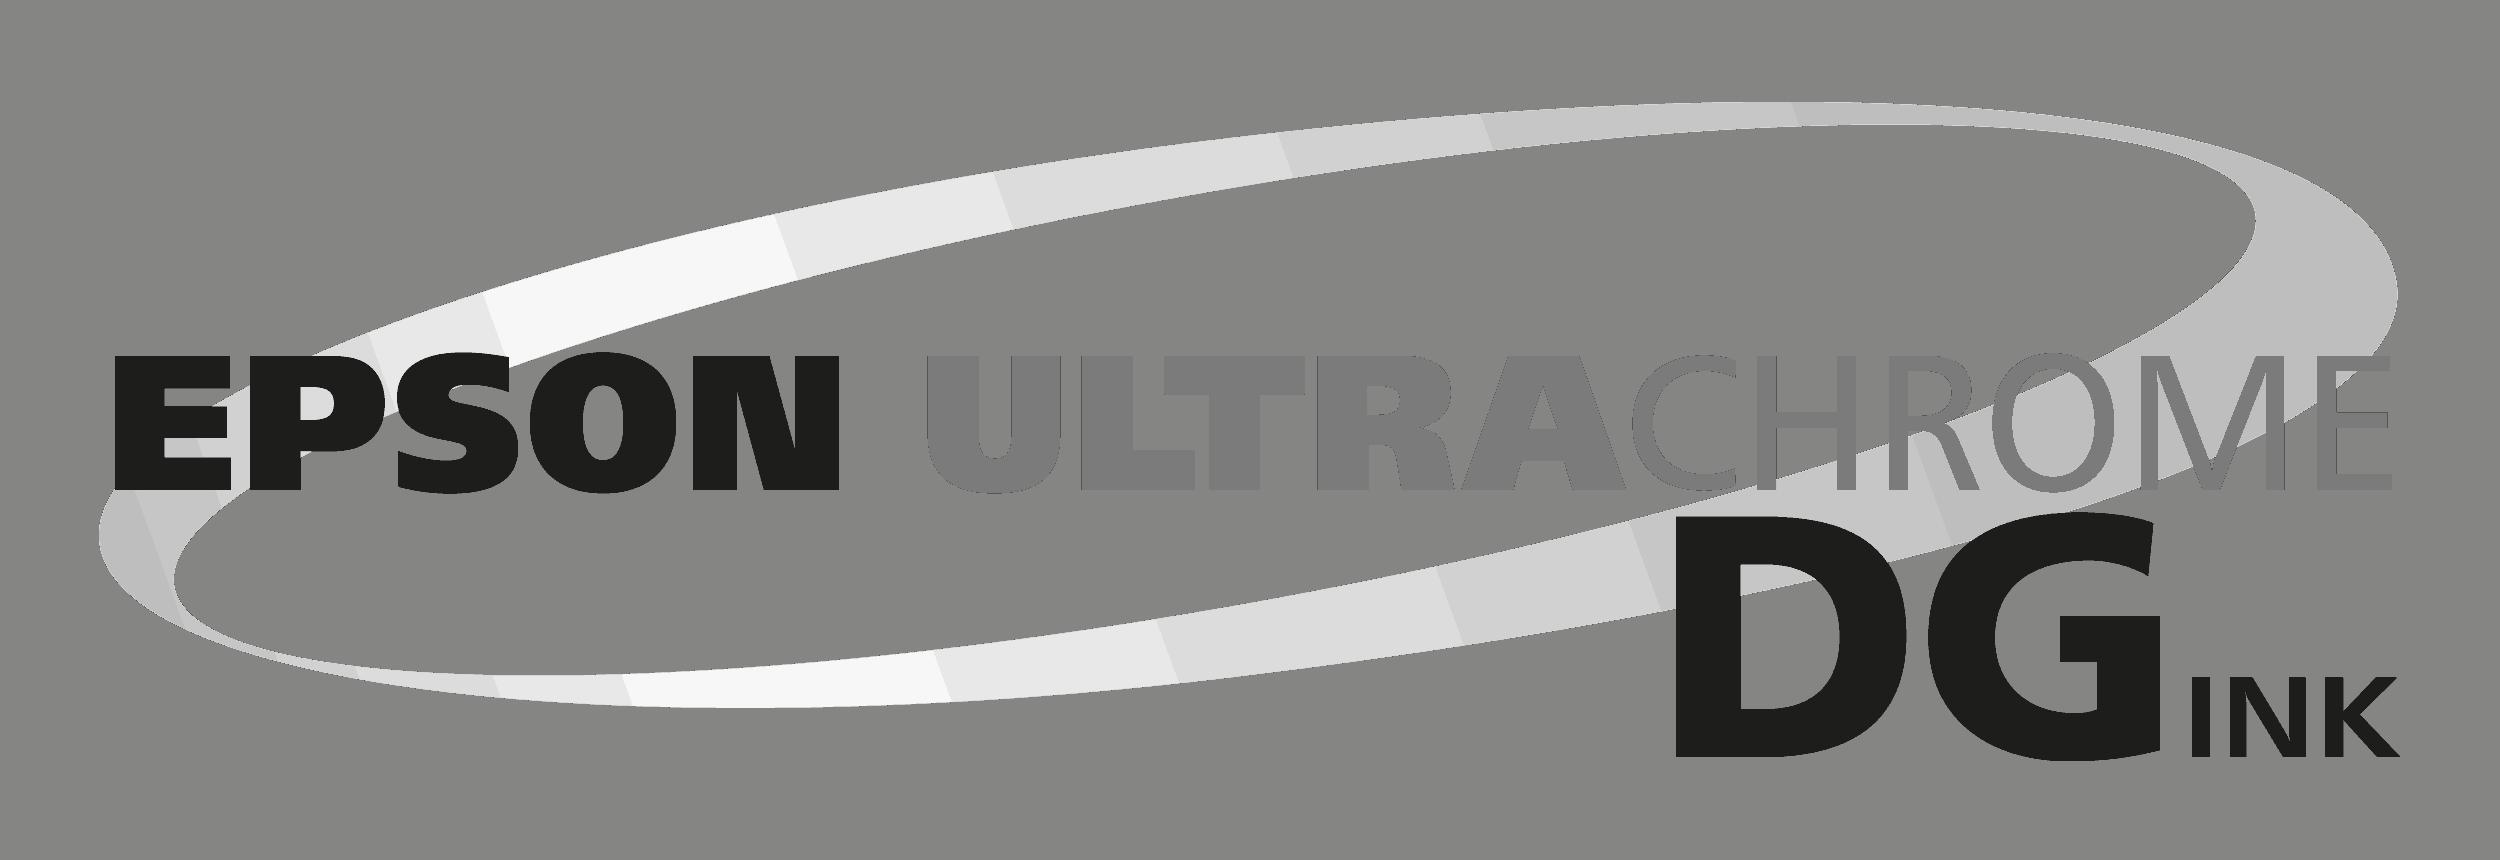 Epson Logo Ultrachrome DG withe monochrome